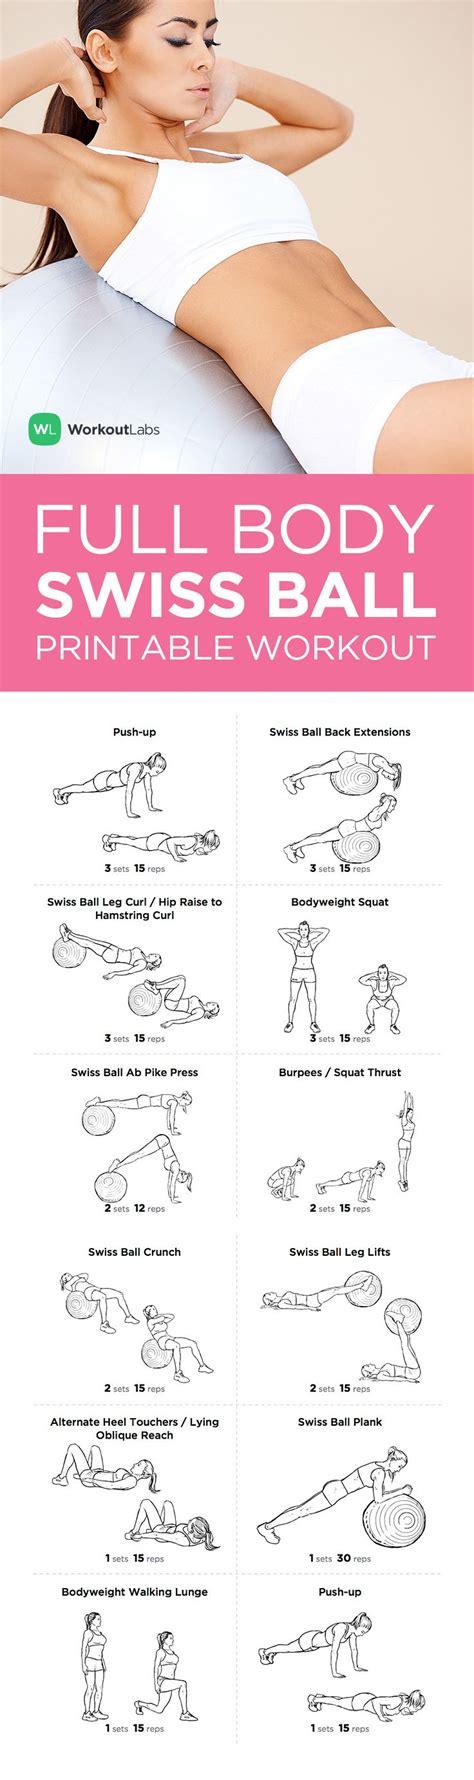 workout workout at home pdf